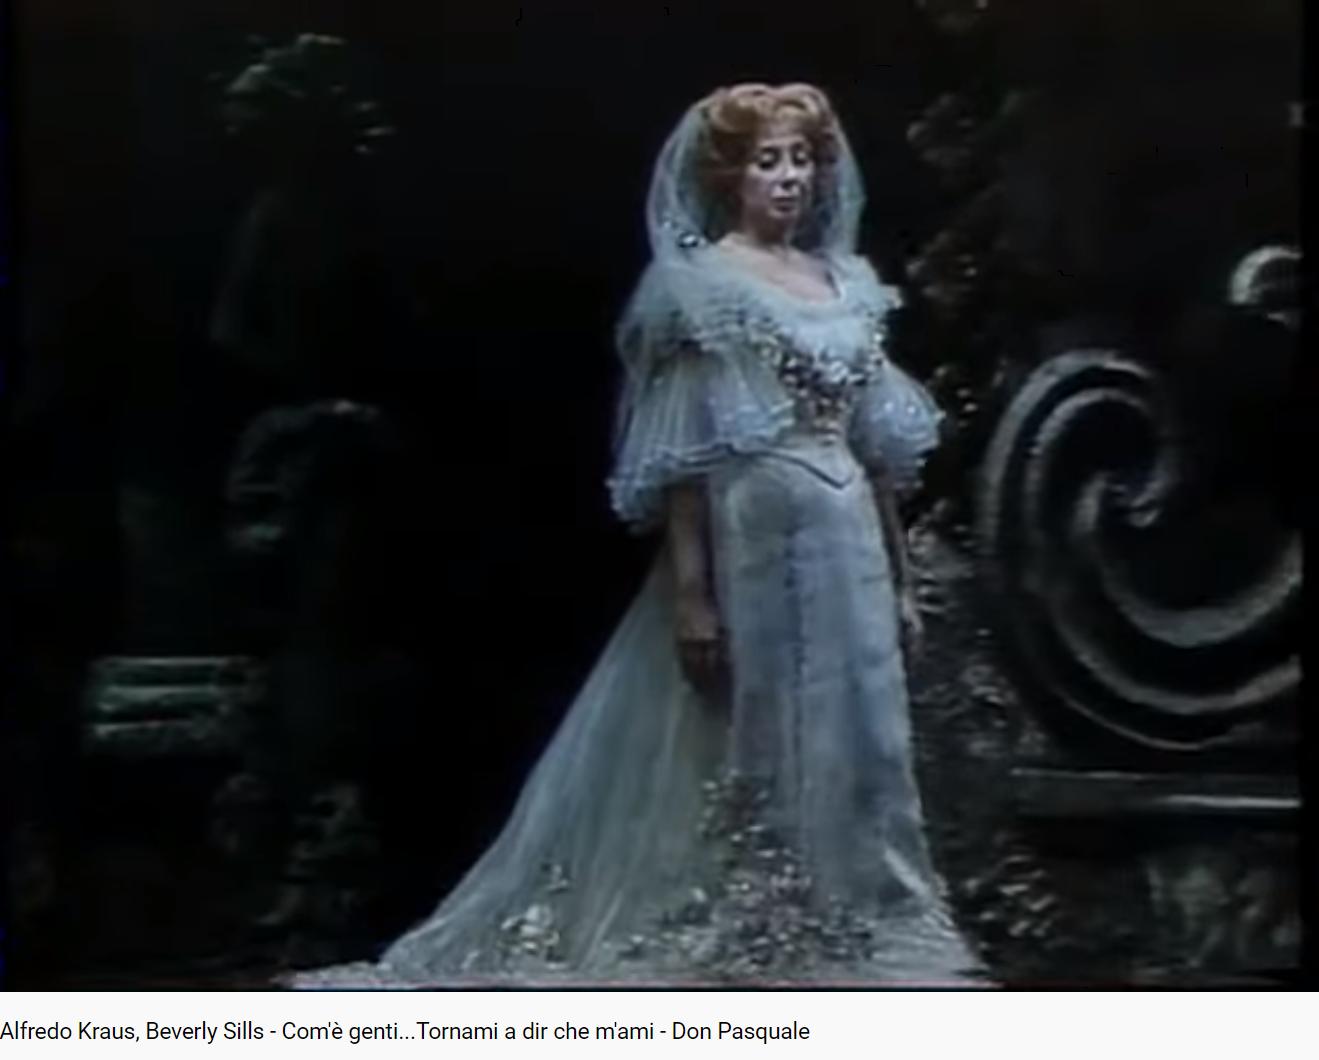 Donizetti Don Pasquale Com'é genti (MET 1979)